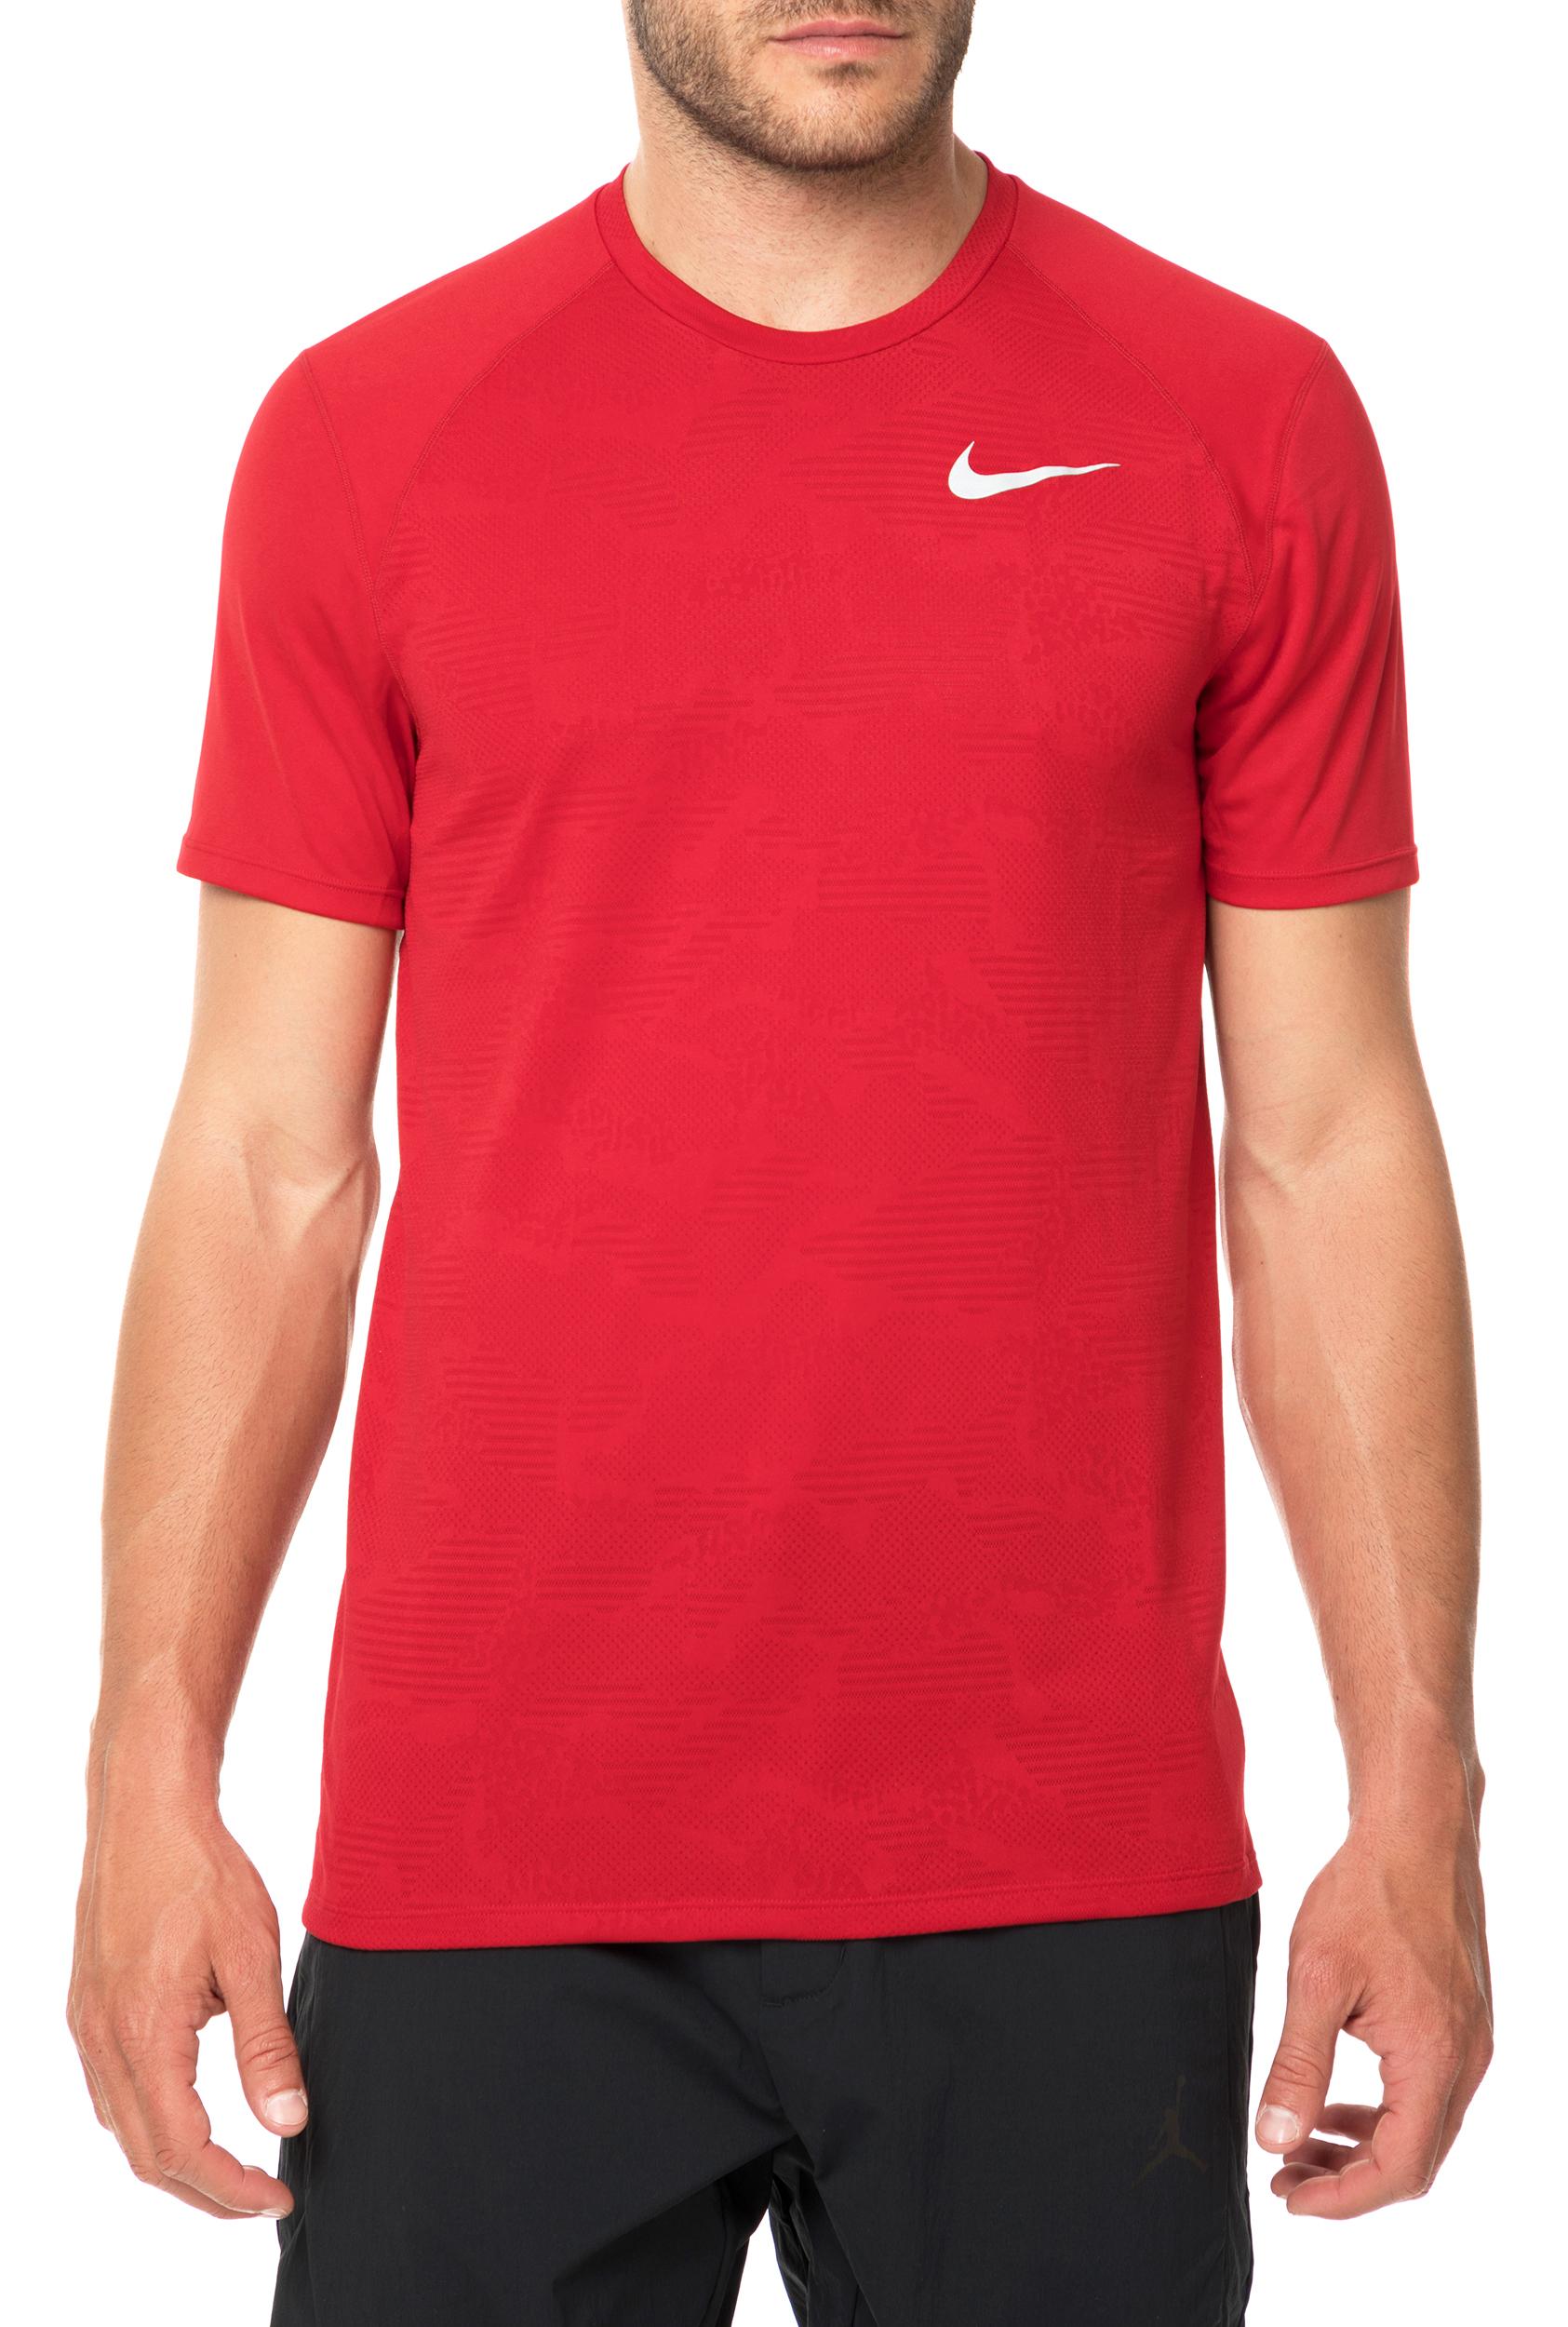 b25ab1964955 NIKE - Ανδρική κοντομάνικη μπλούζα NIKE BREATHE MILER κόκκινη